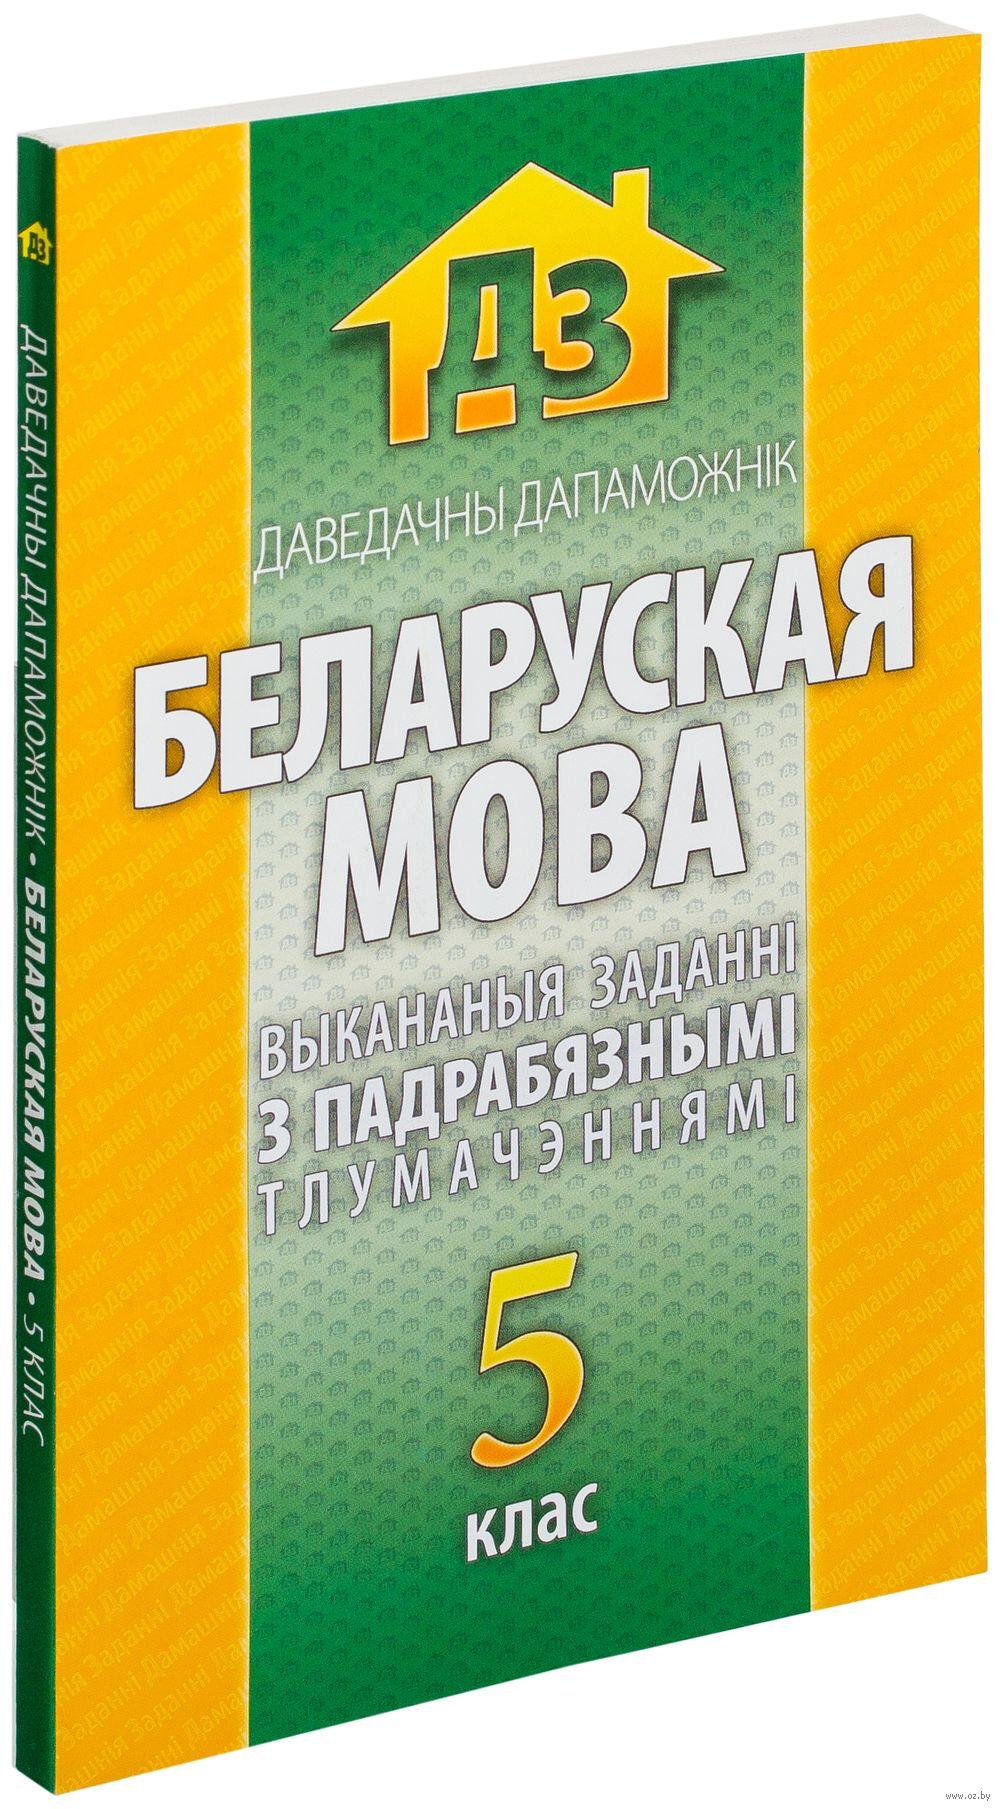 Решебник белaрускaй мове 5 клaс